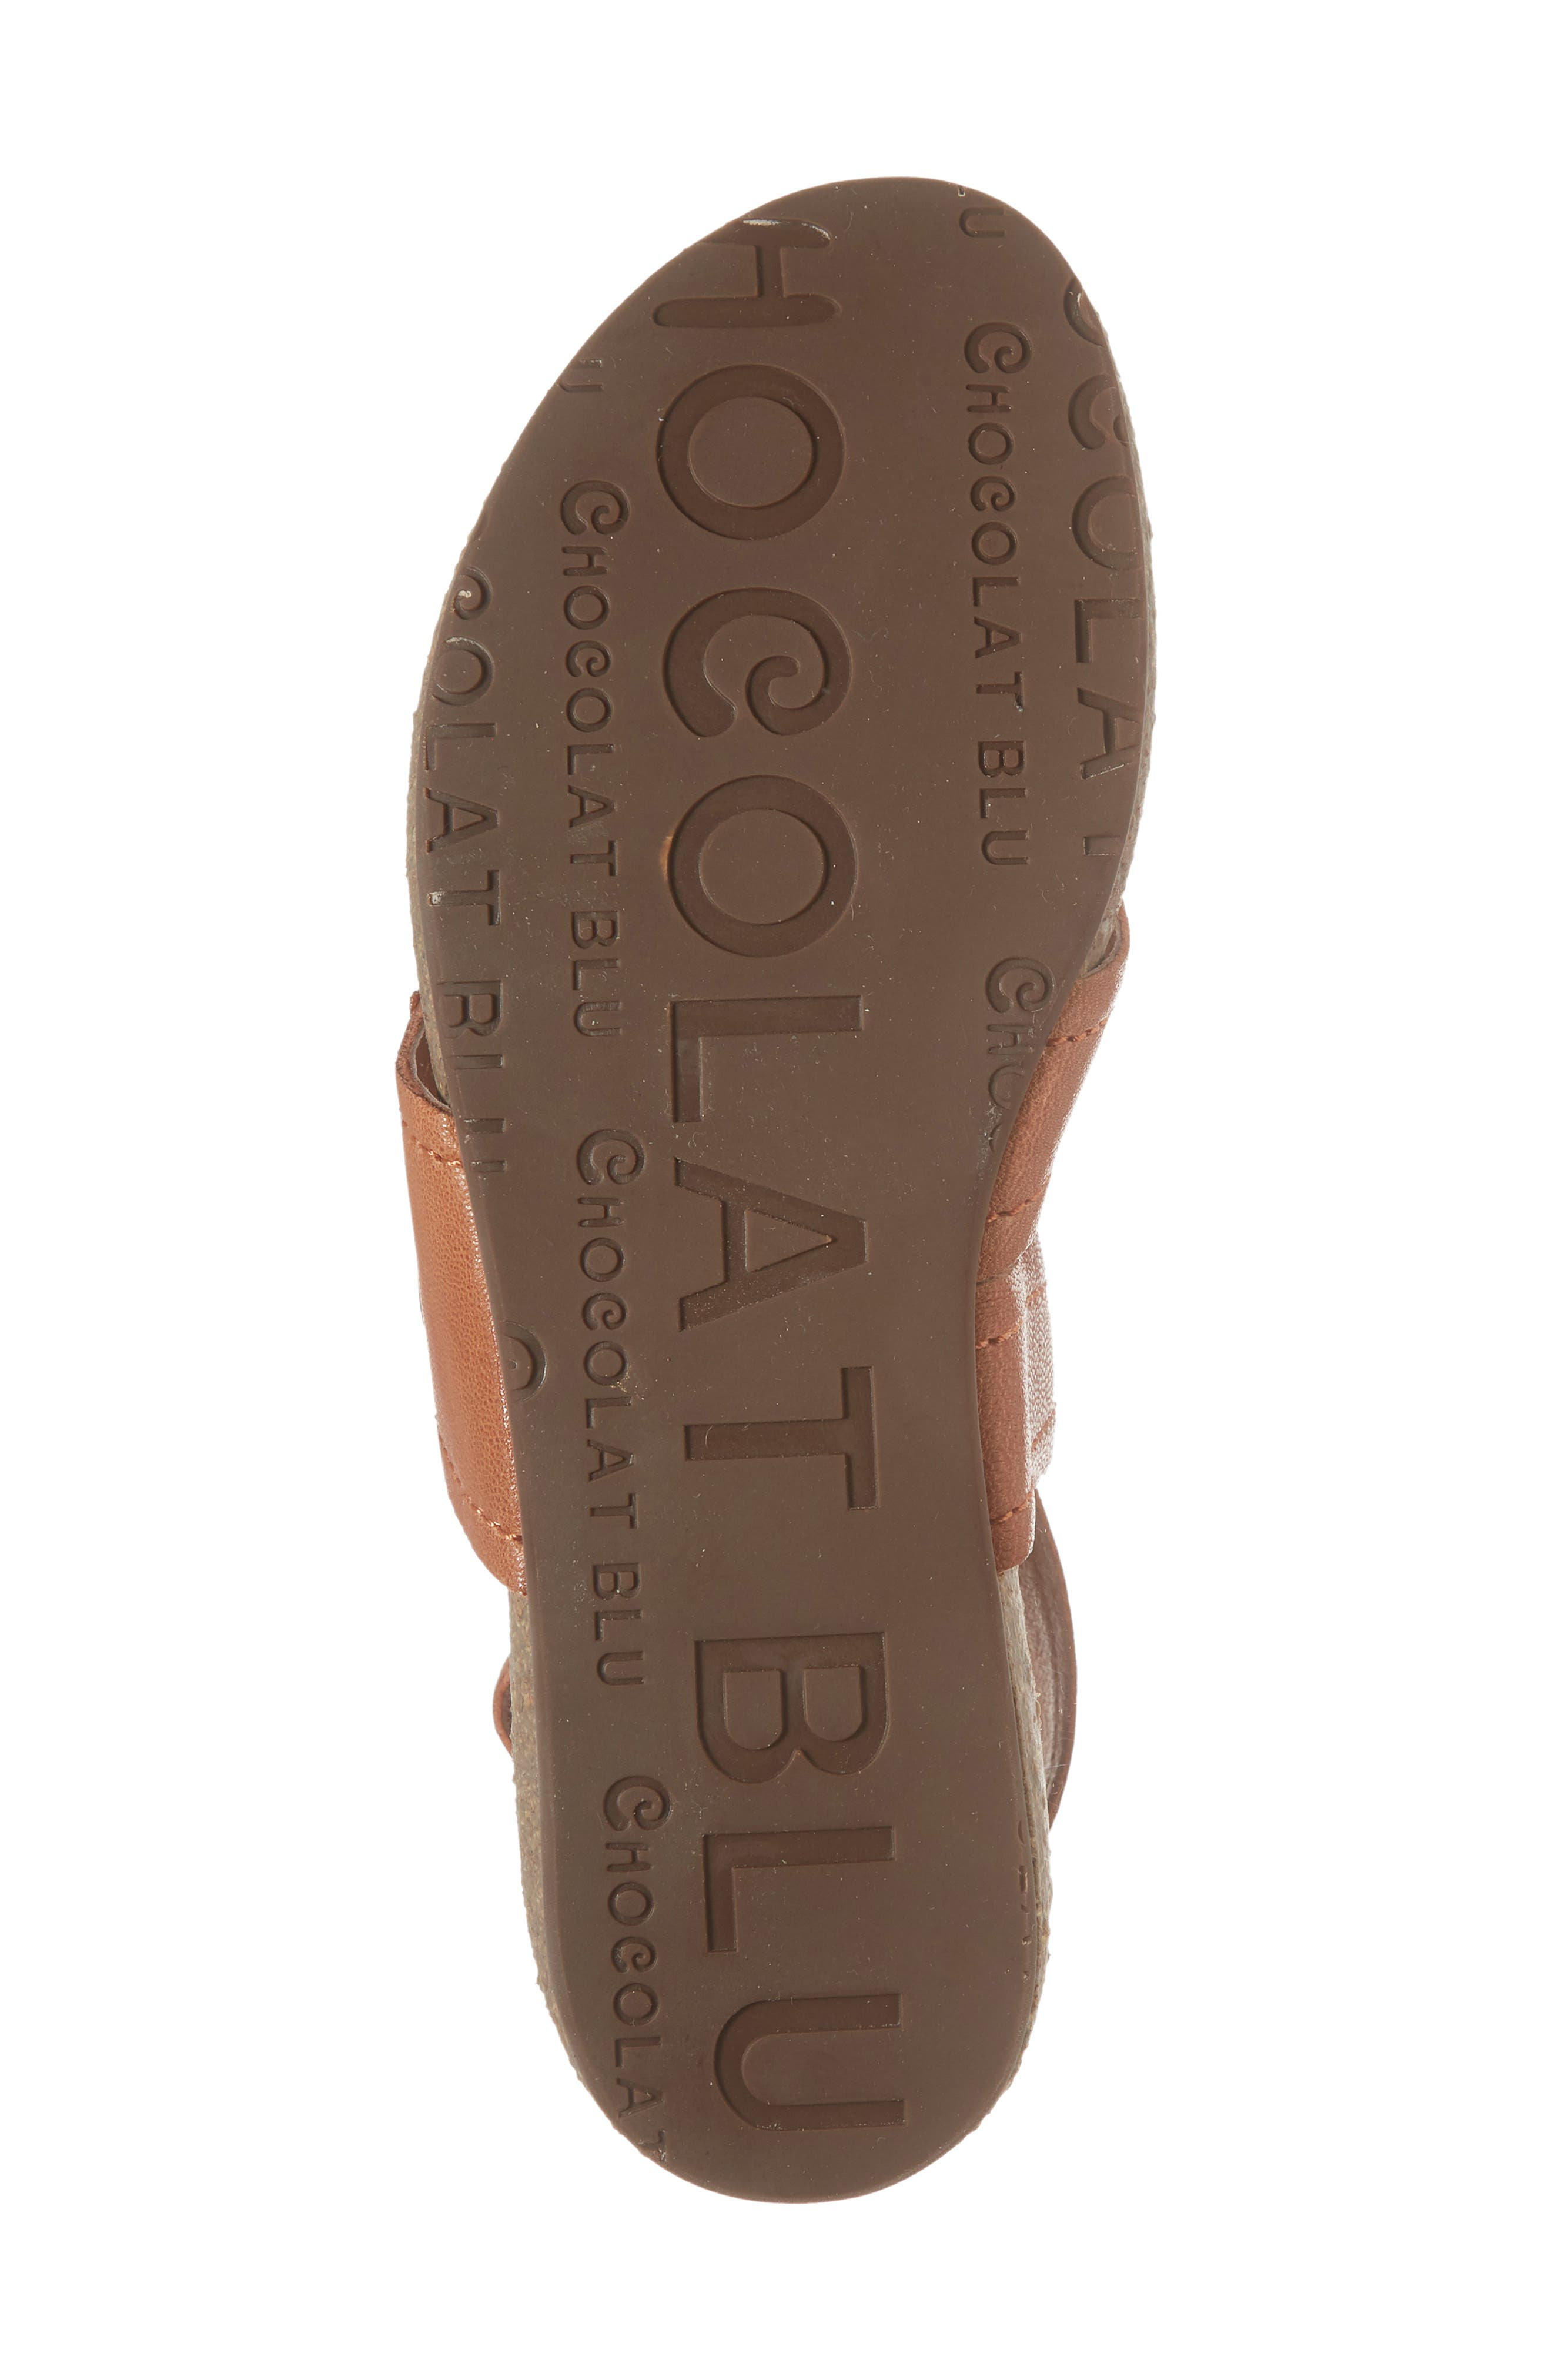 Yagger Sandal,                             Alternate thumbnail 6, color,                             Camel Leather